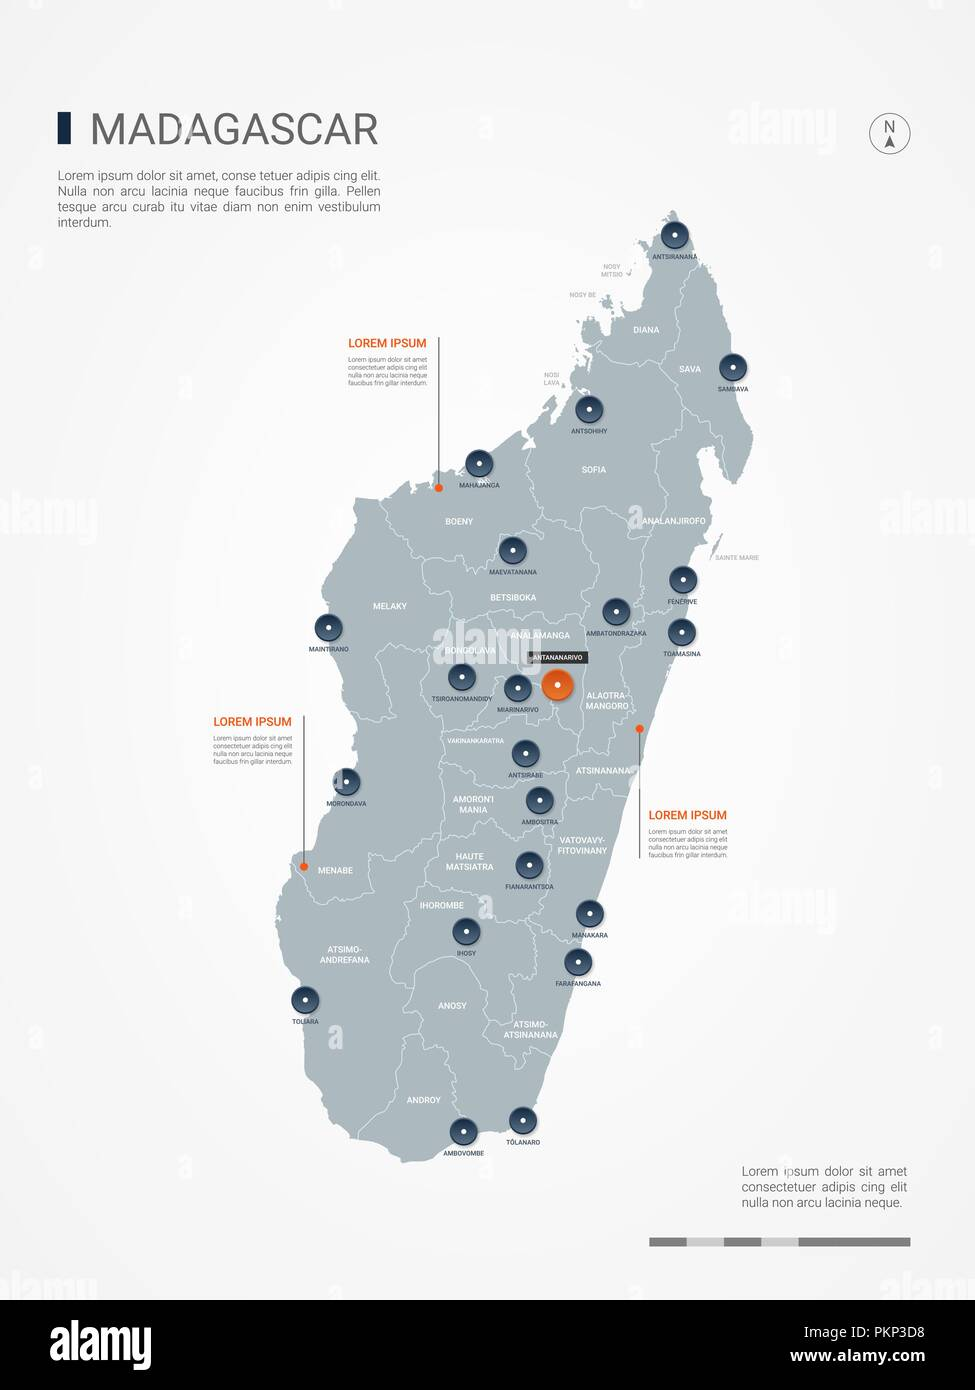 Madagaskar Karte.Madagaskar Karte Mit Grenzen Stadte Kapital Und